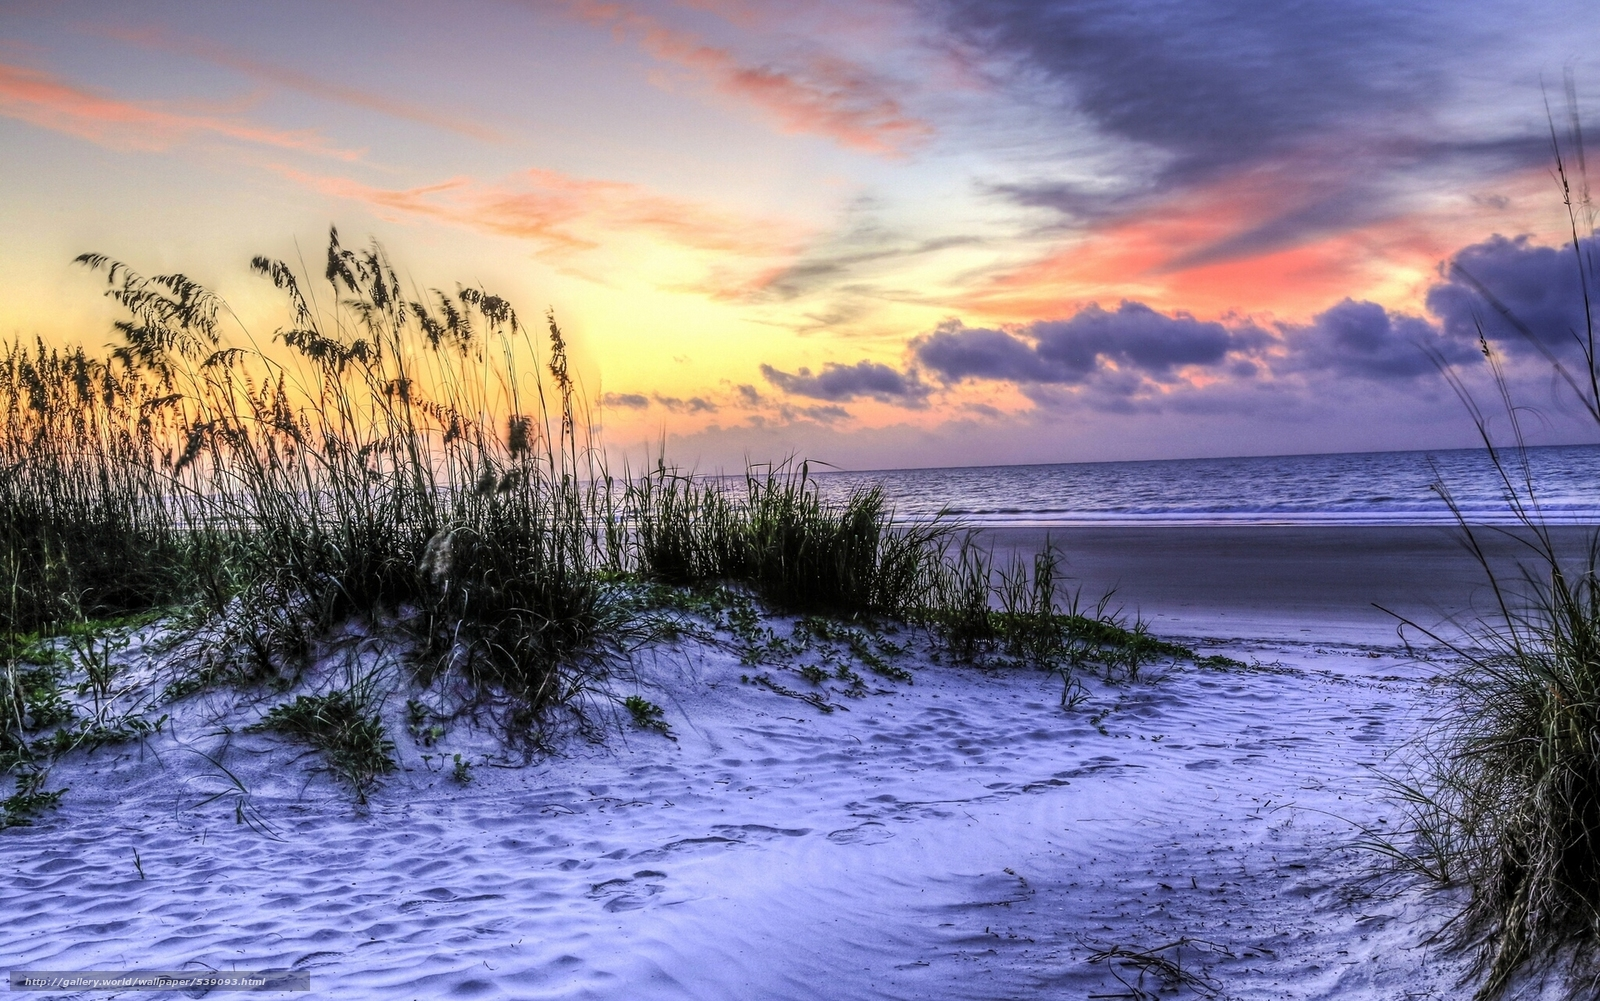 Download wallpaper Hilton Head Island South Carolina Atlantic Ocean 1600x1001